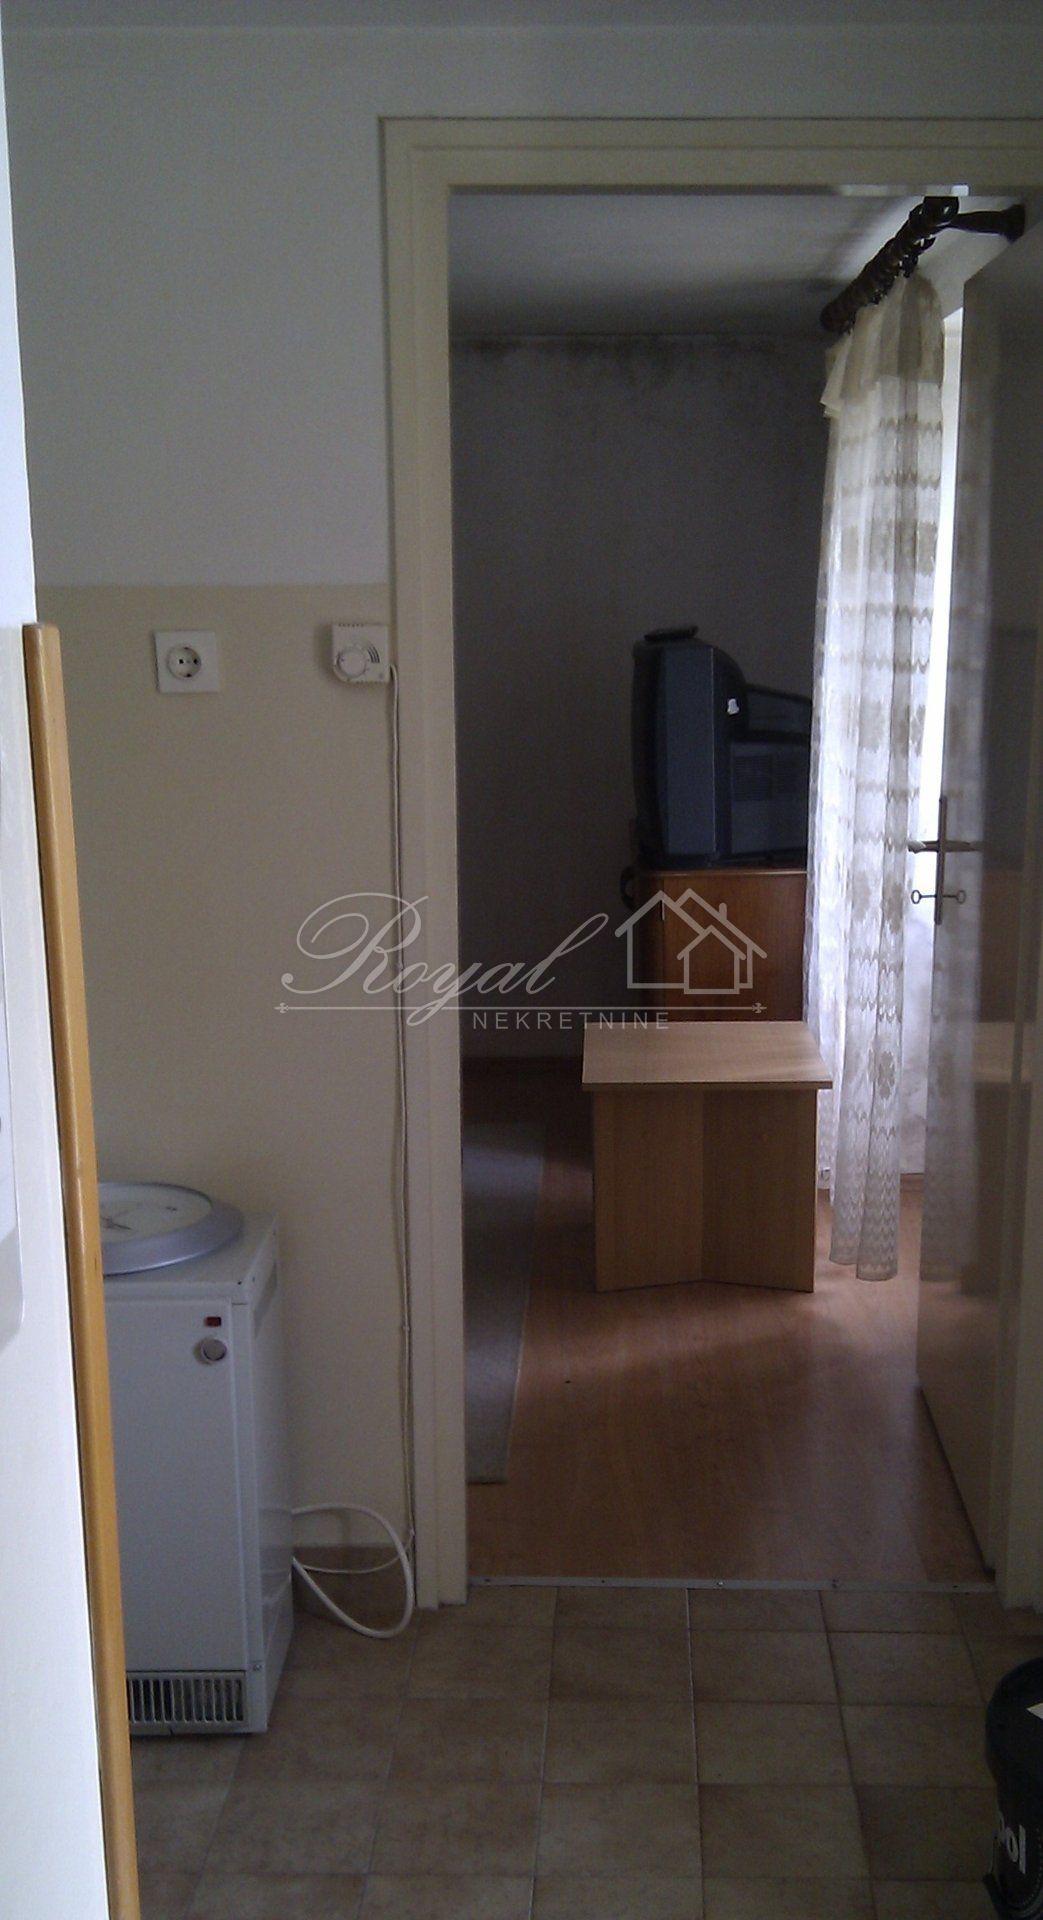 Apartment Long Term Rental, Belveder, Rijeka, €210